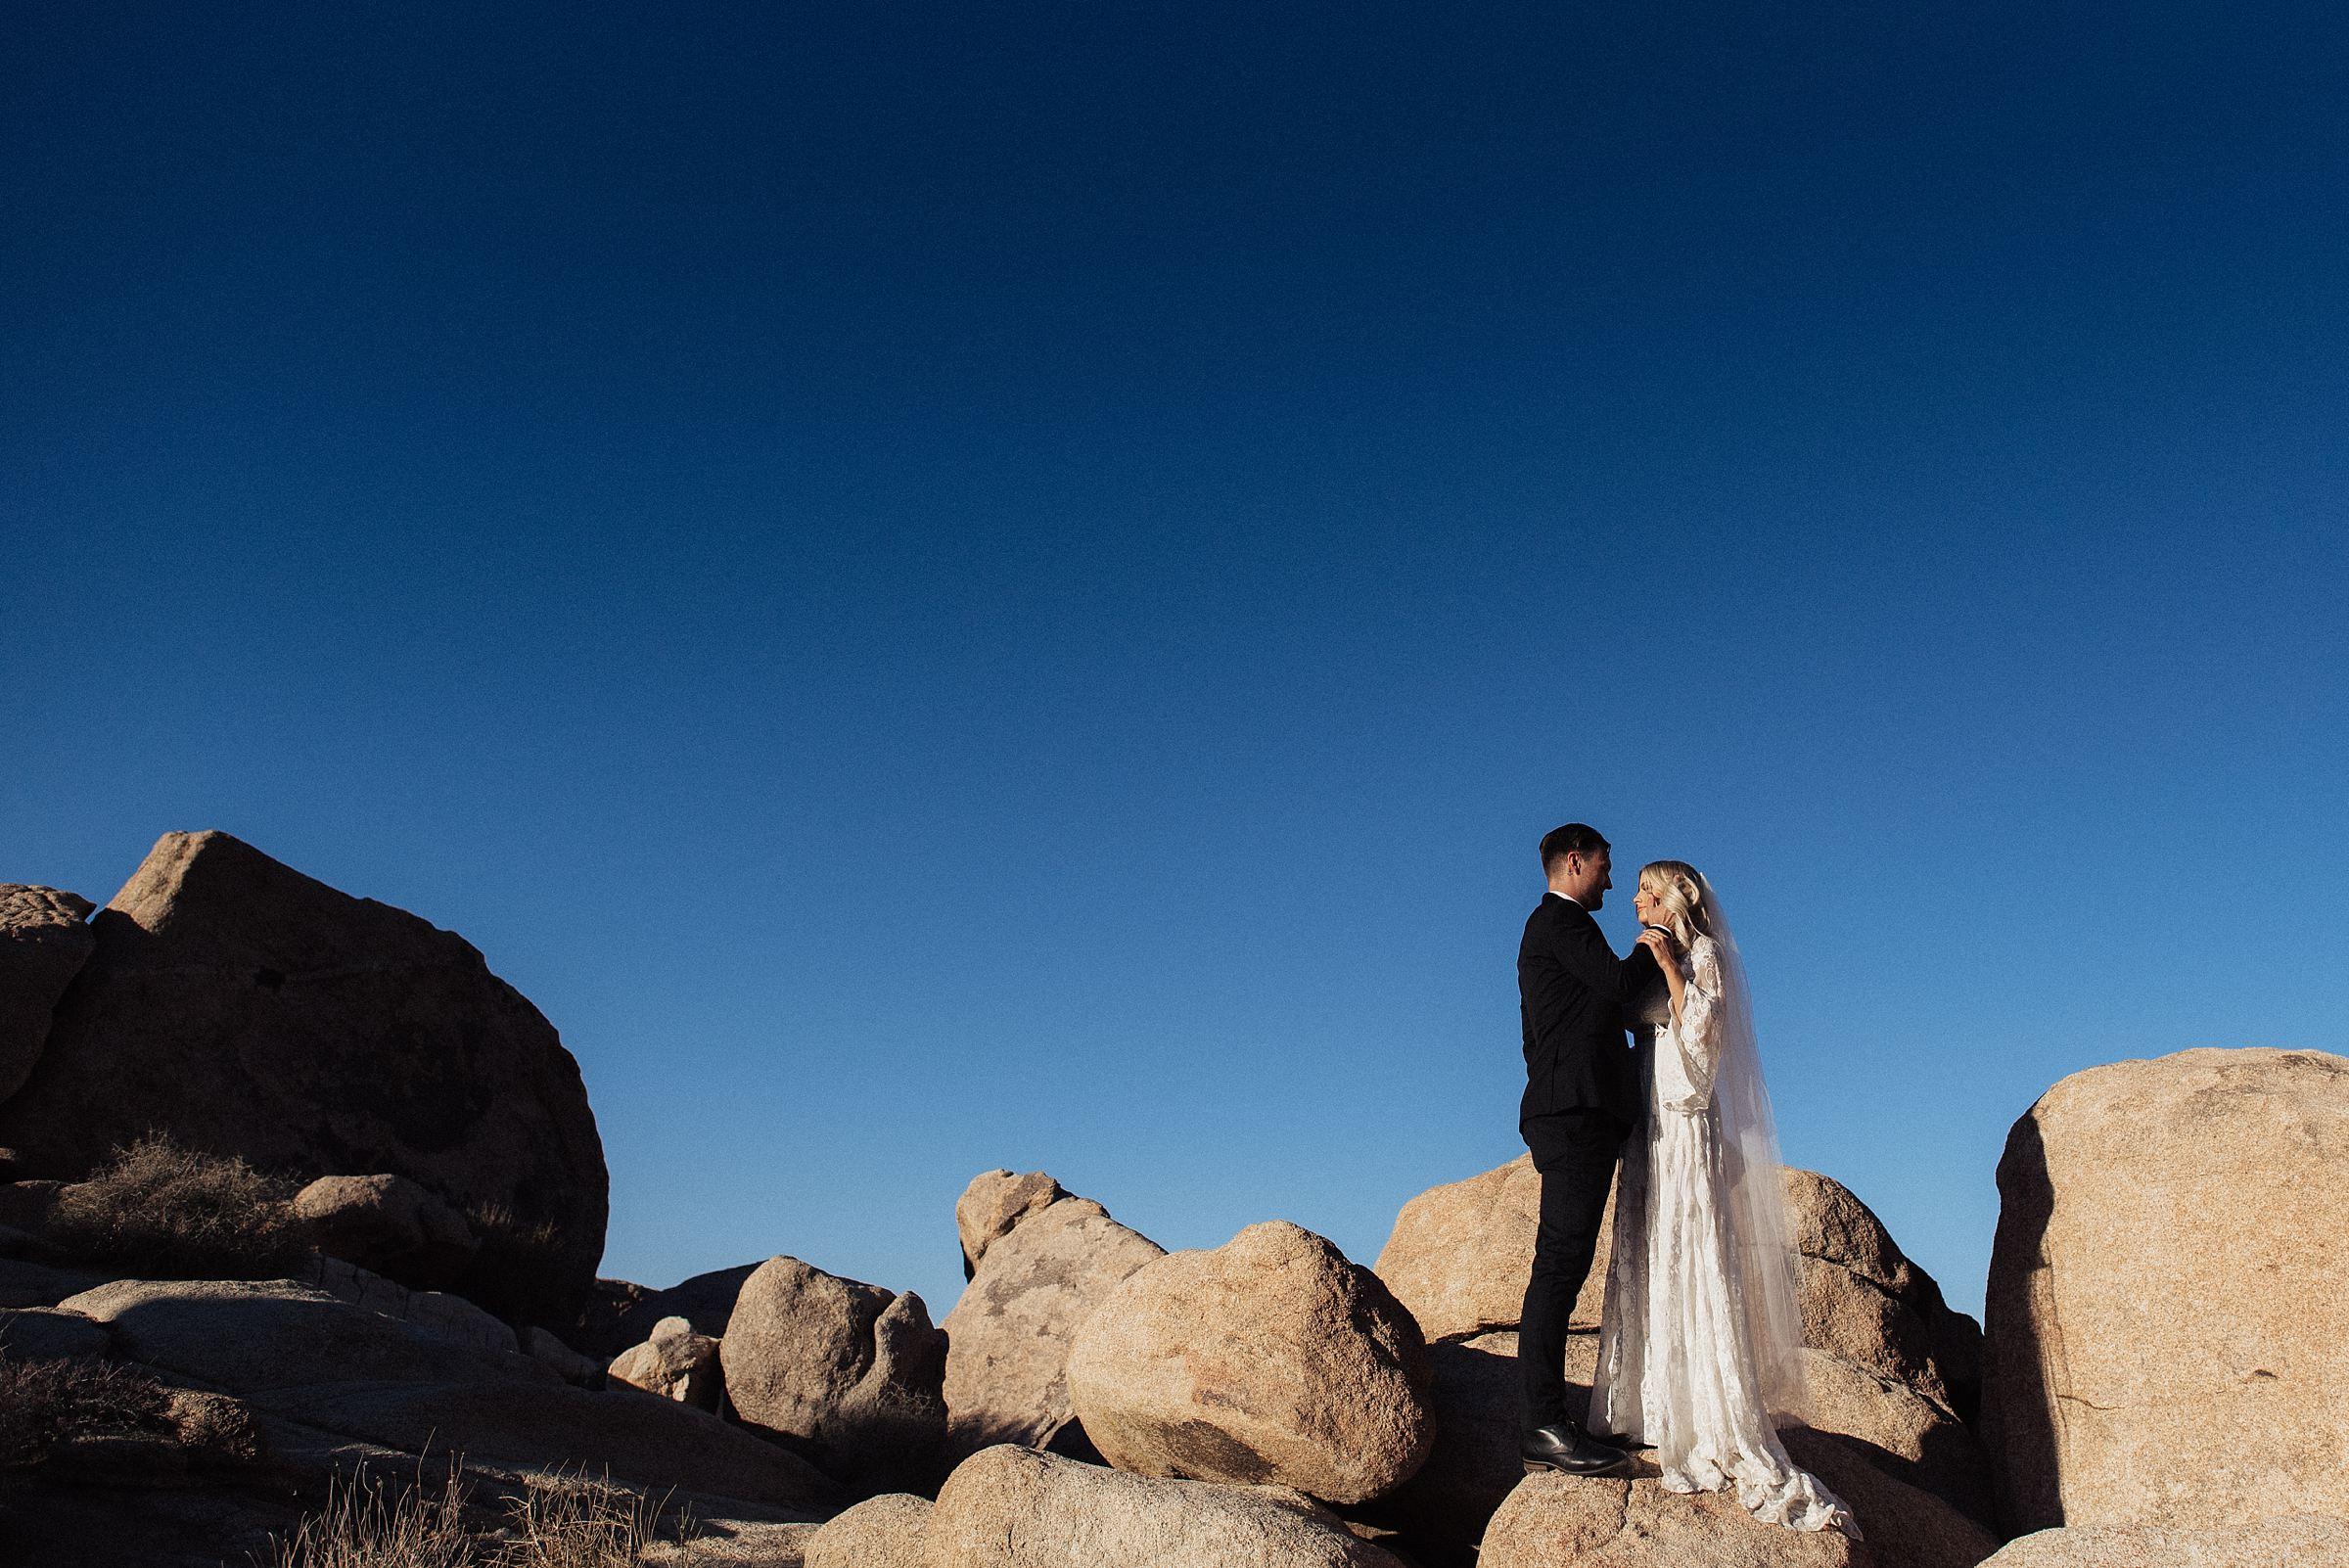 joshua tree wedding at cactus moon retreat